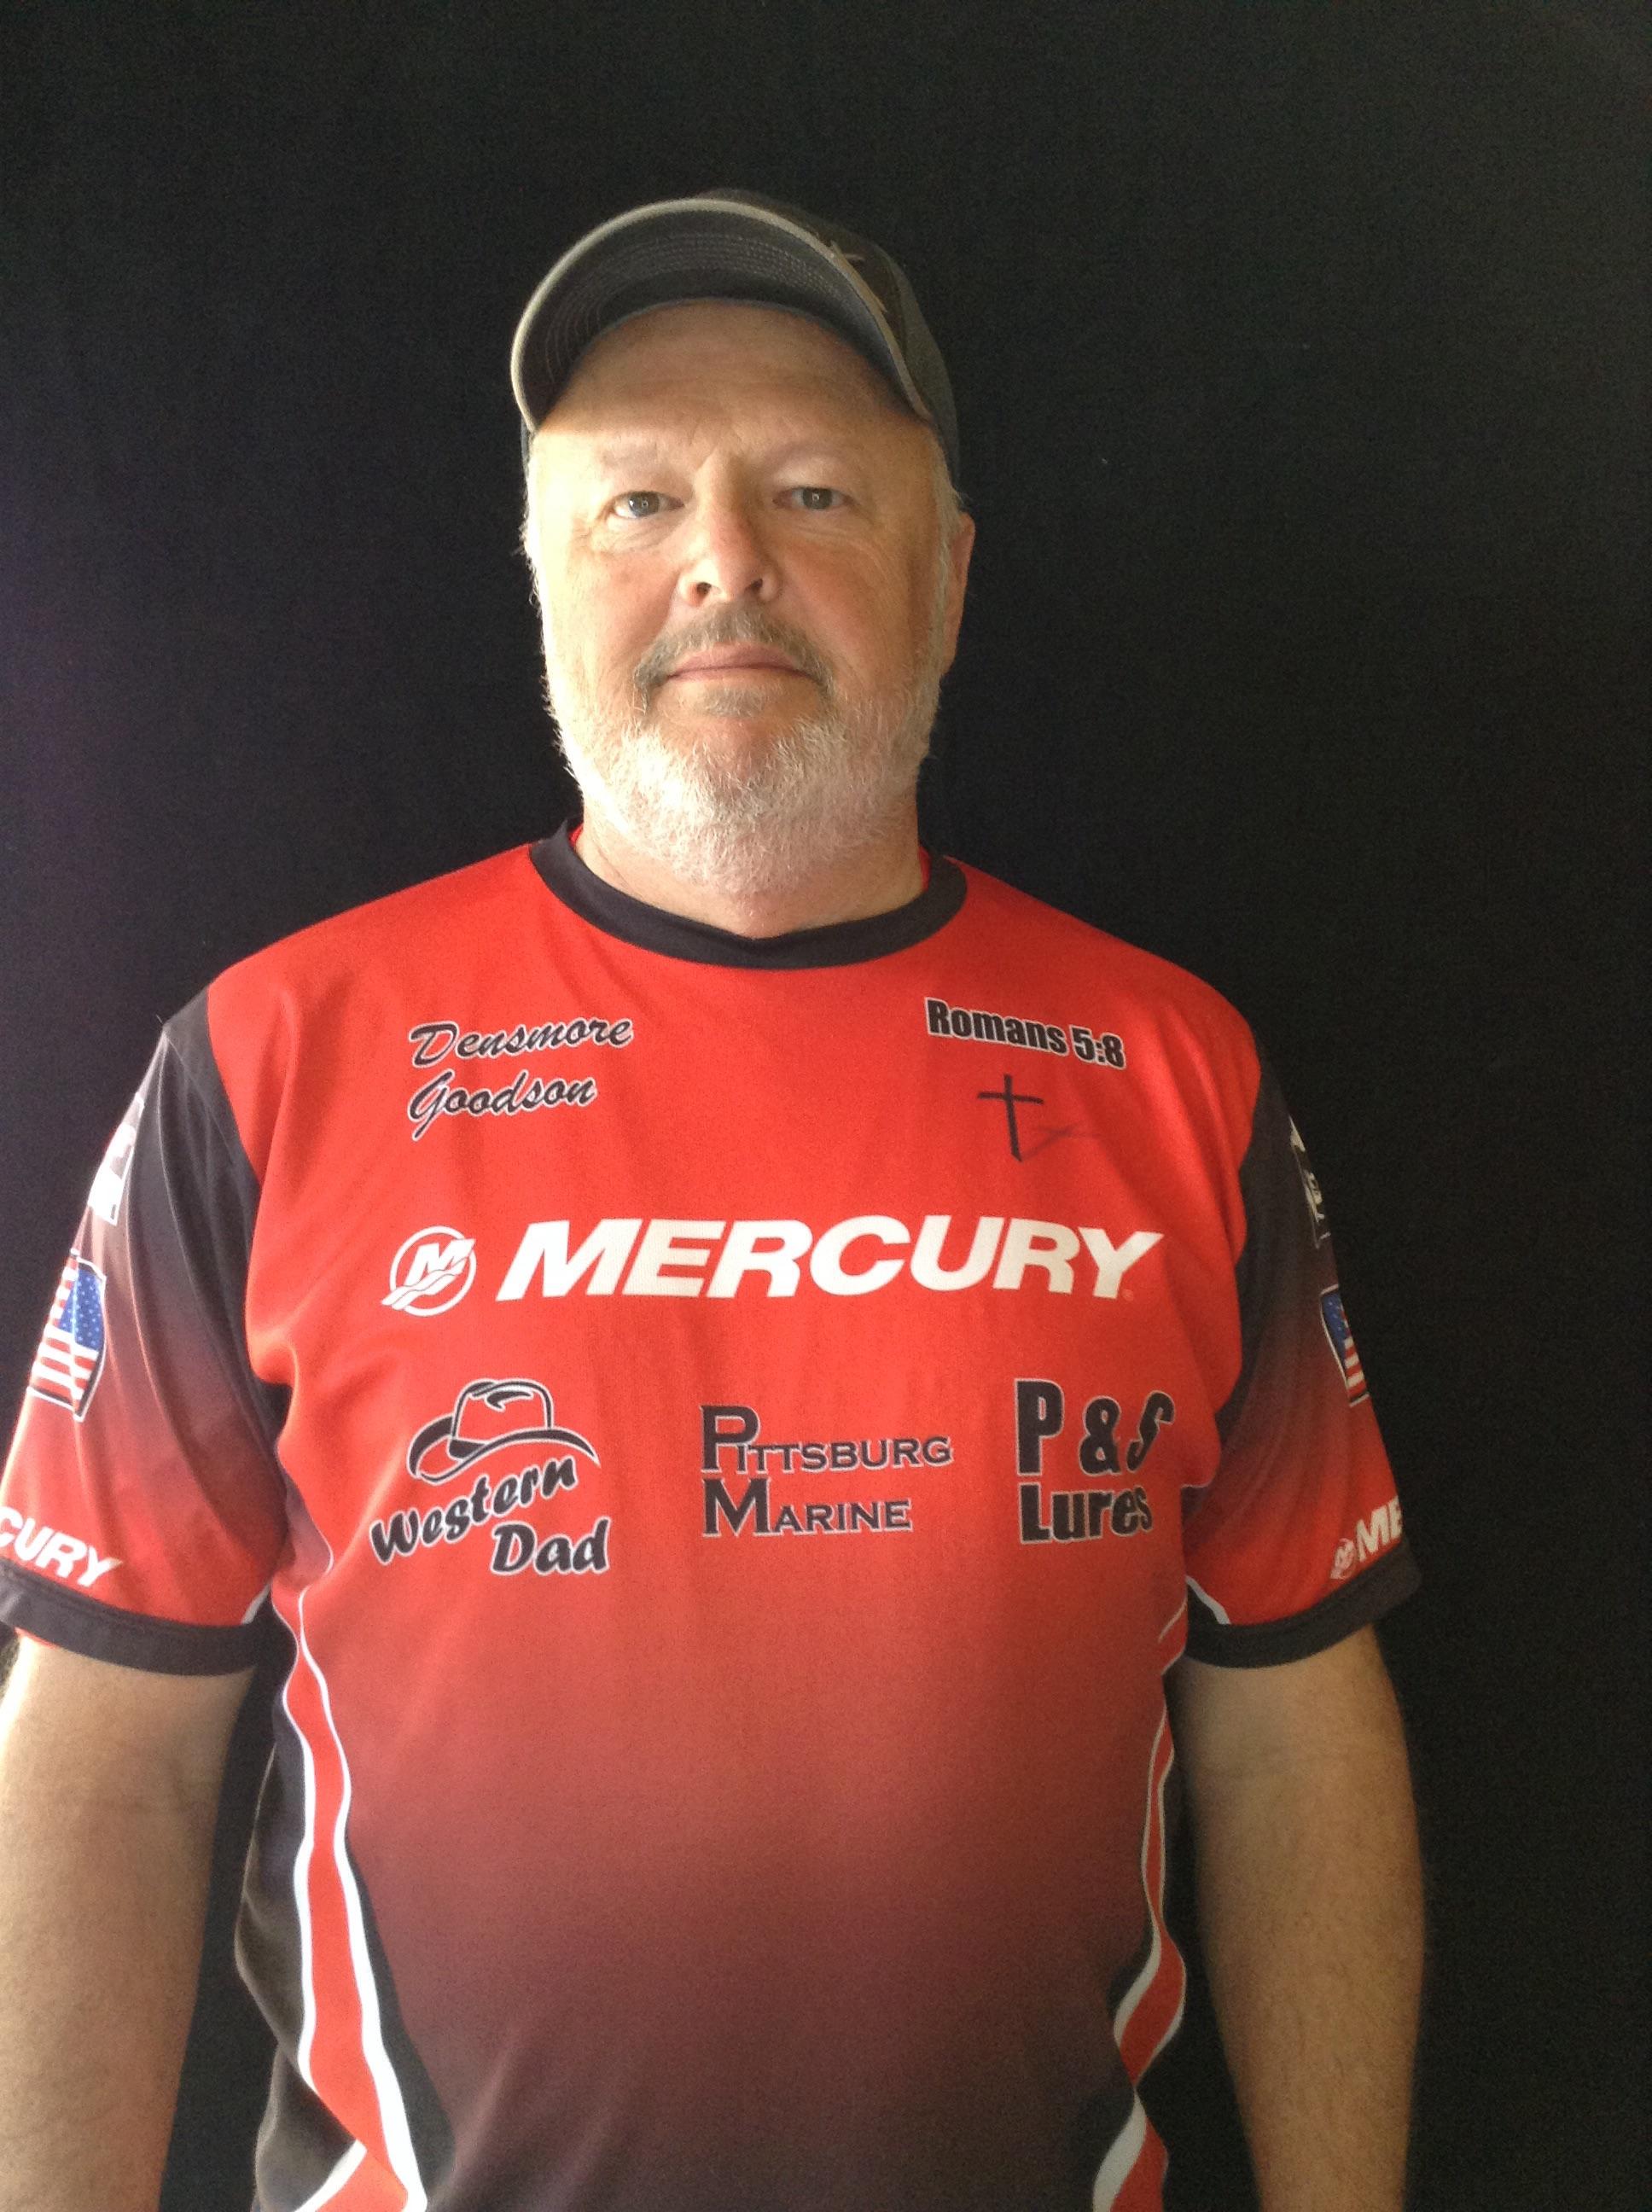 MLF Densmore Goodson Profile